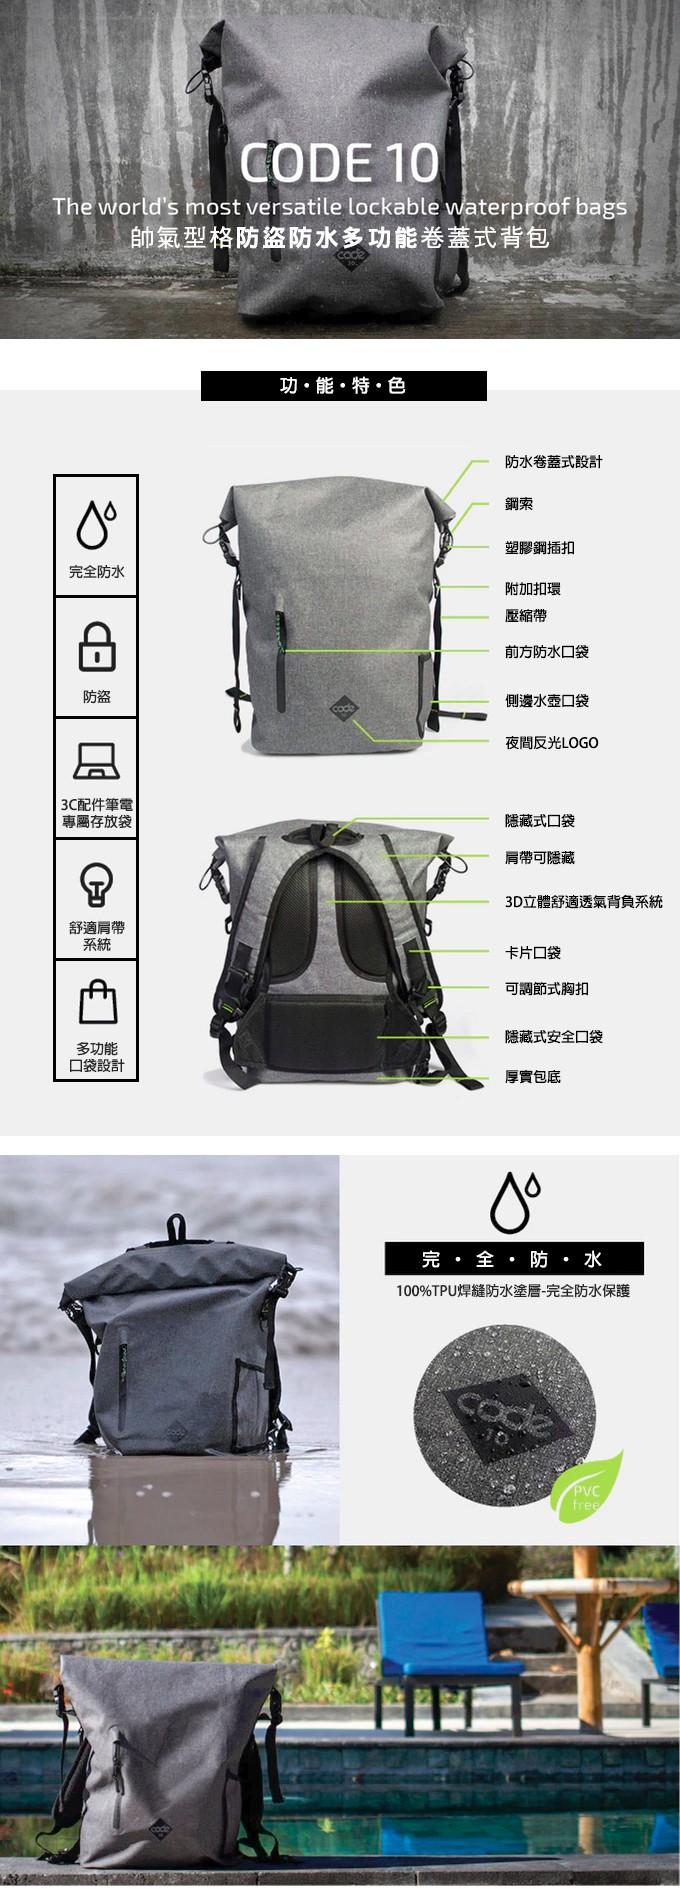 Code-10-Waterproof-Theft-Proof-Tech-Ready-backpacks-01